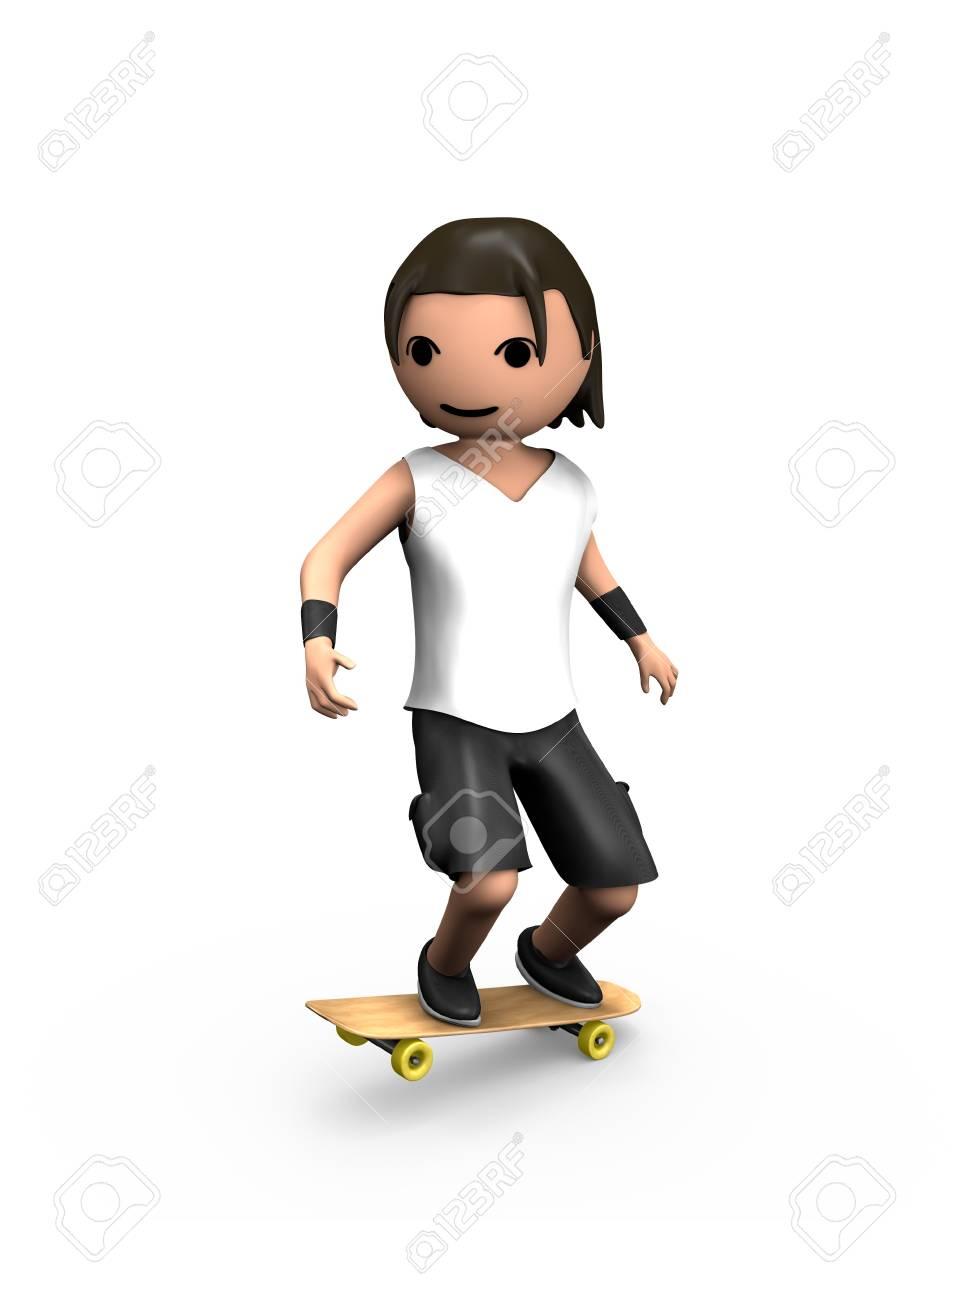 Modern 3D Man Performing Trick on Wooden Skateboard - 7841840